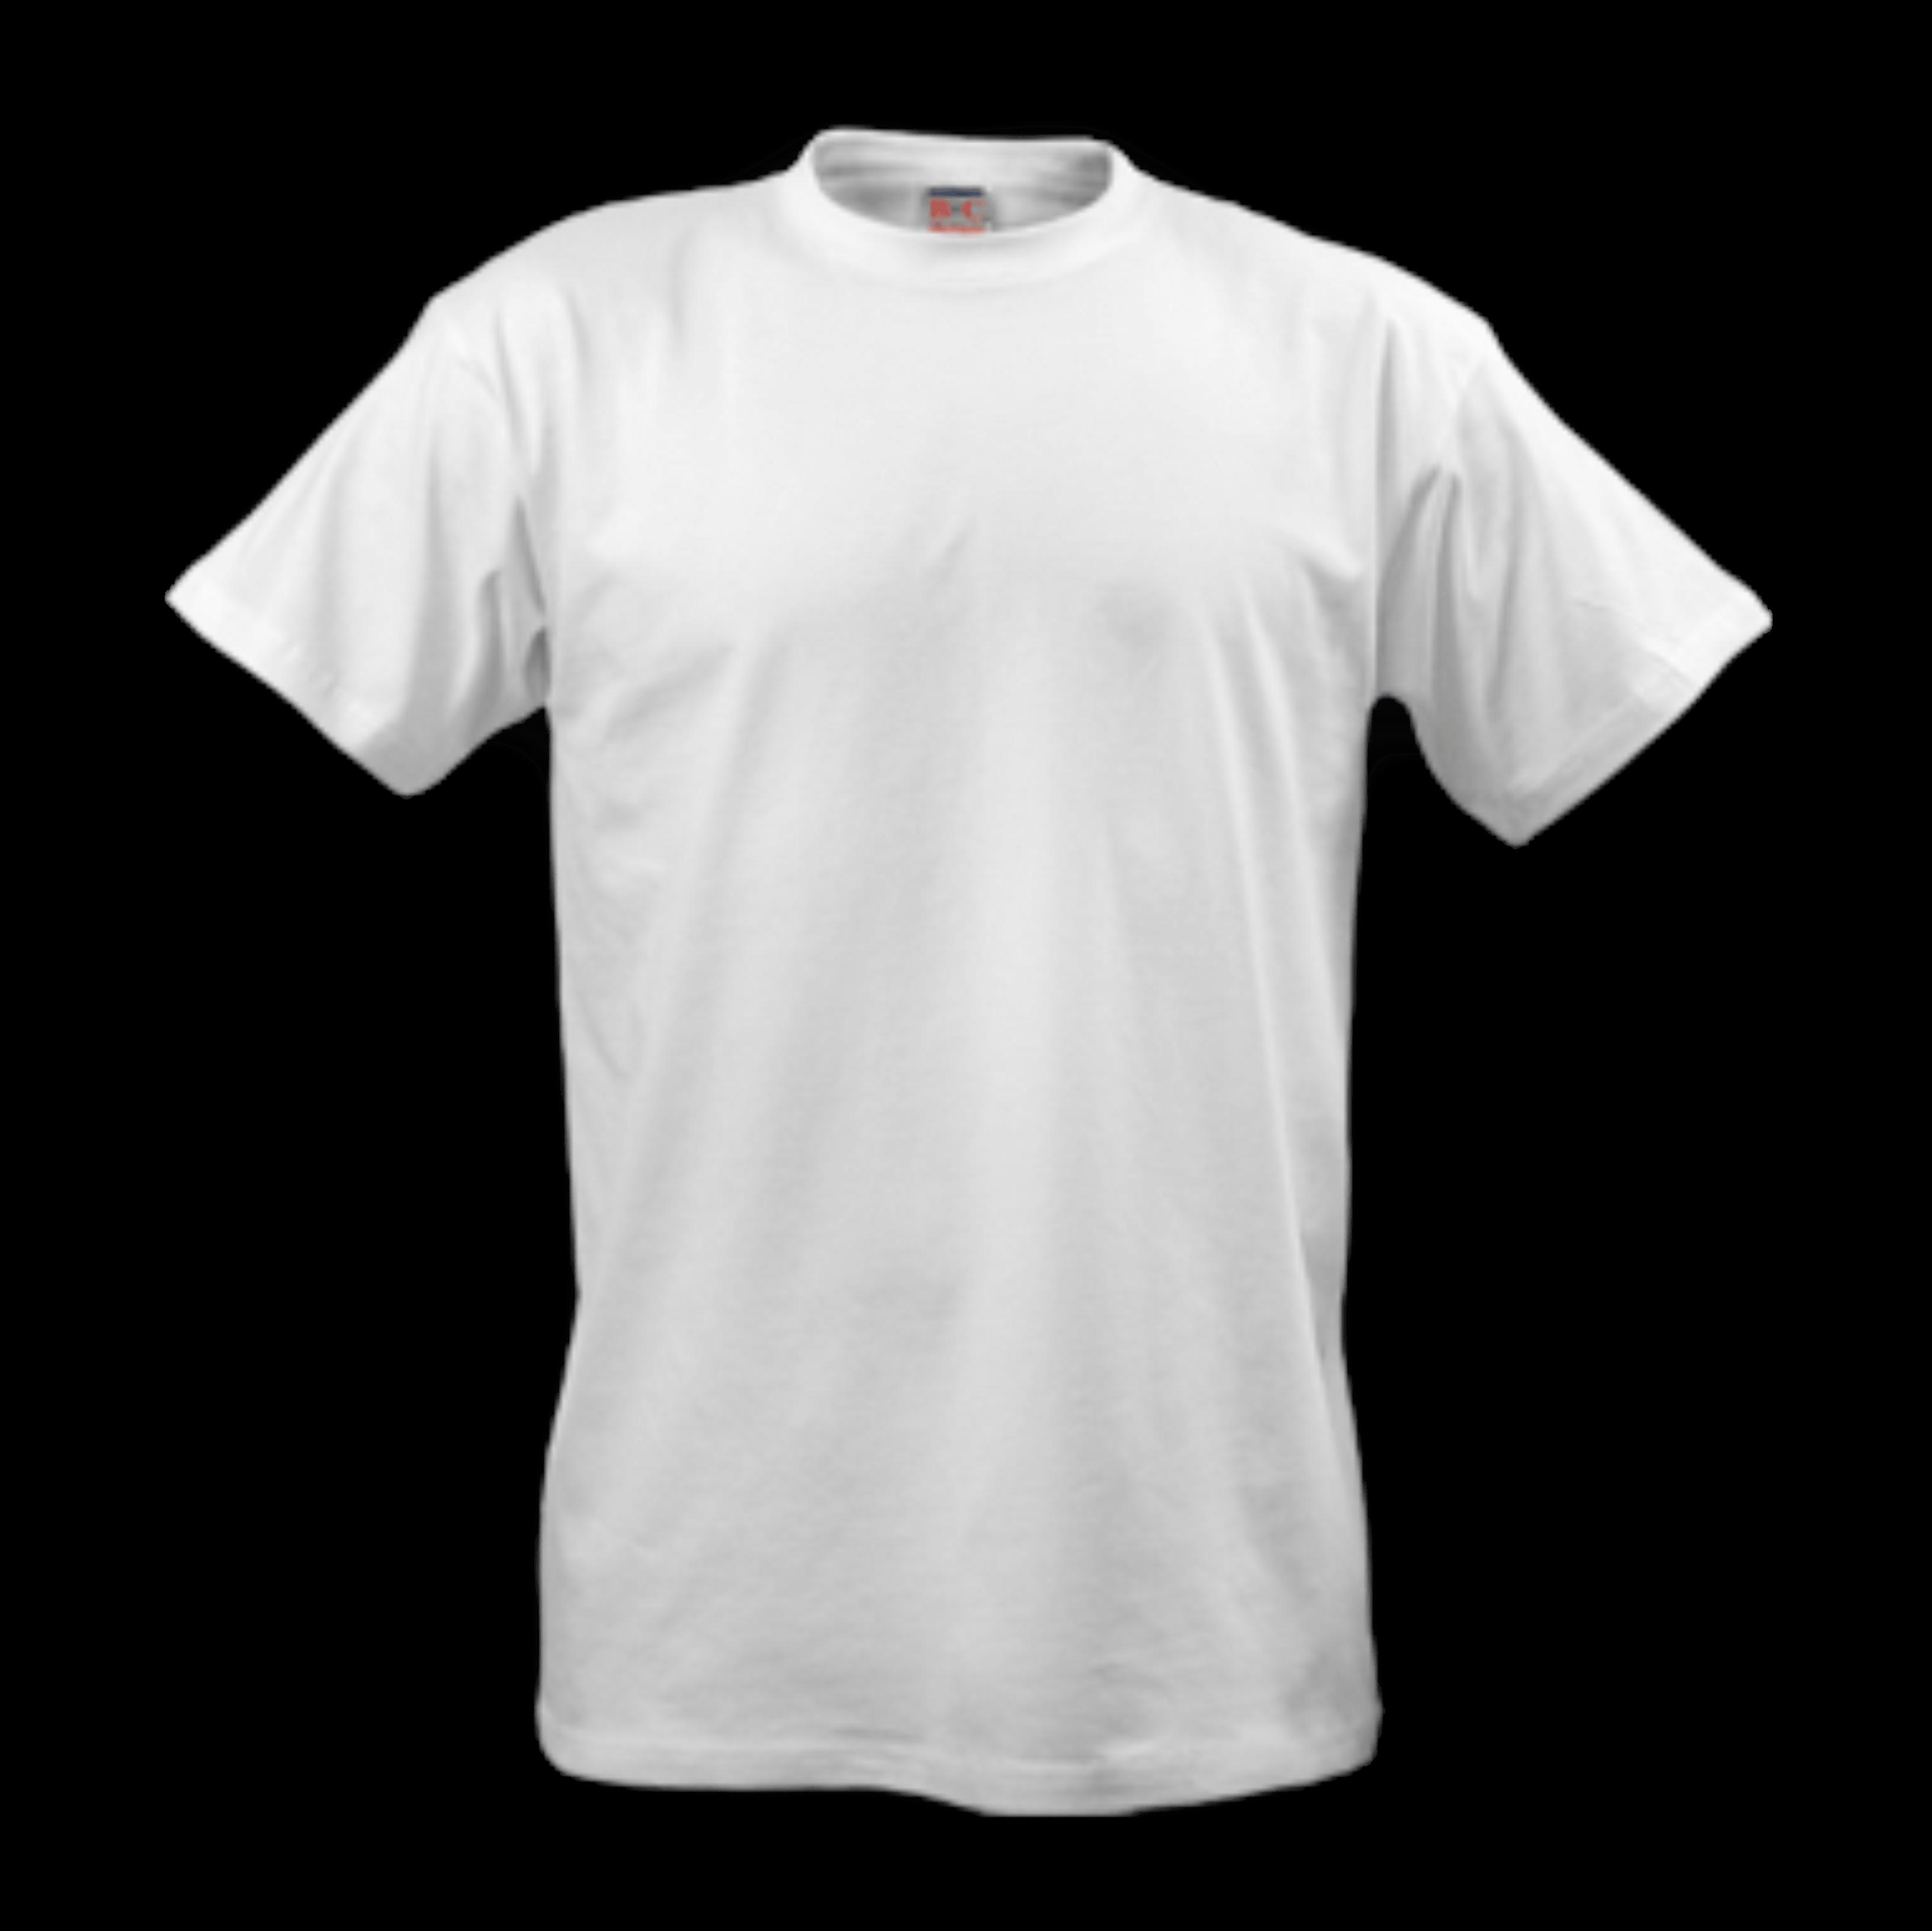 download free white t shirt png image icon favicon freepngimg t shirt png image icon favicon freepngimg